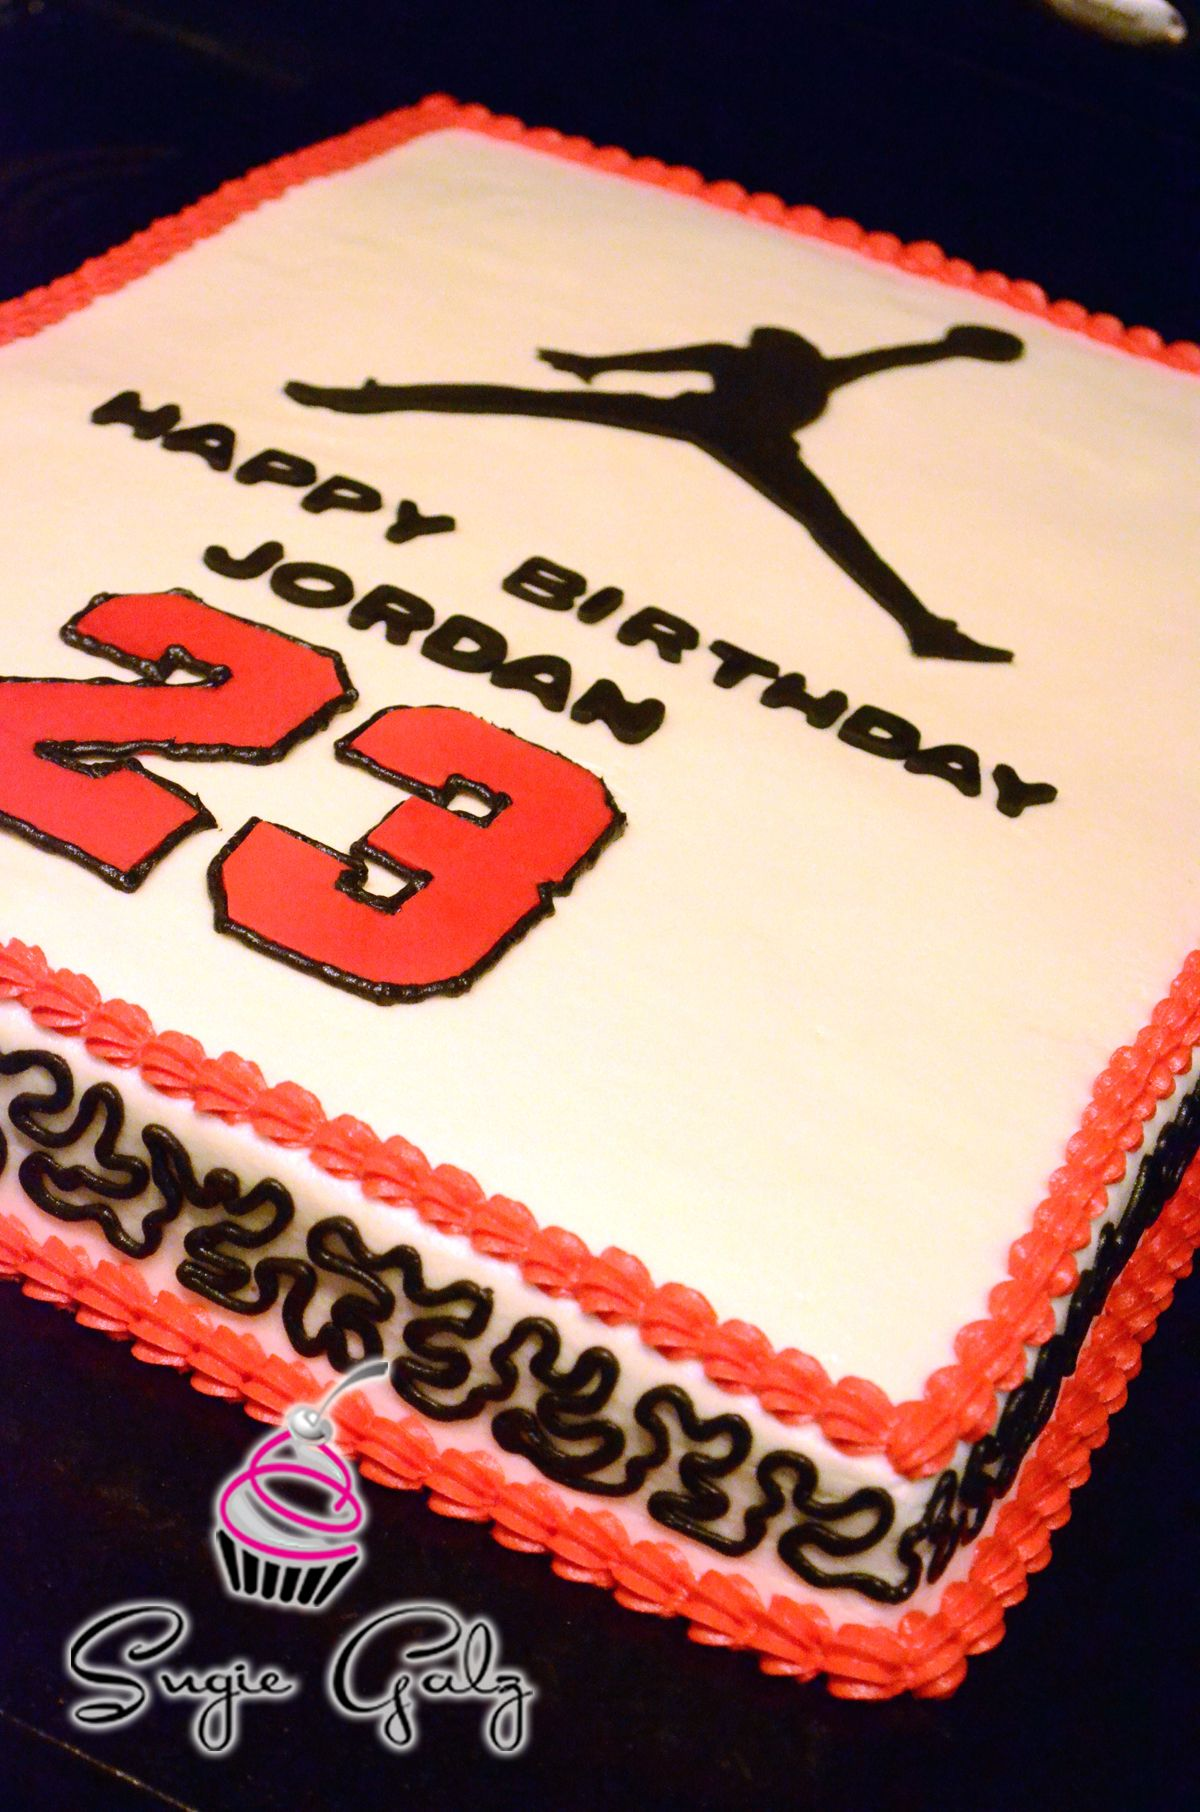 Fun Michael Jordan Birthday Cake in Austin Texas by Sugie Galz